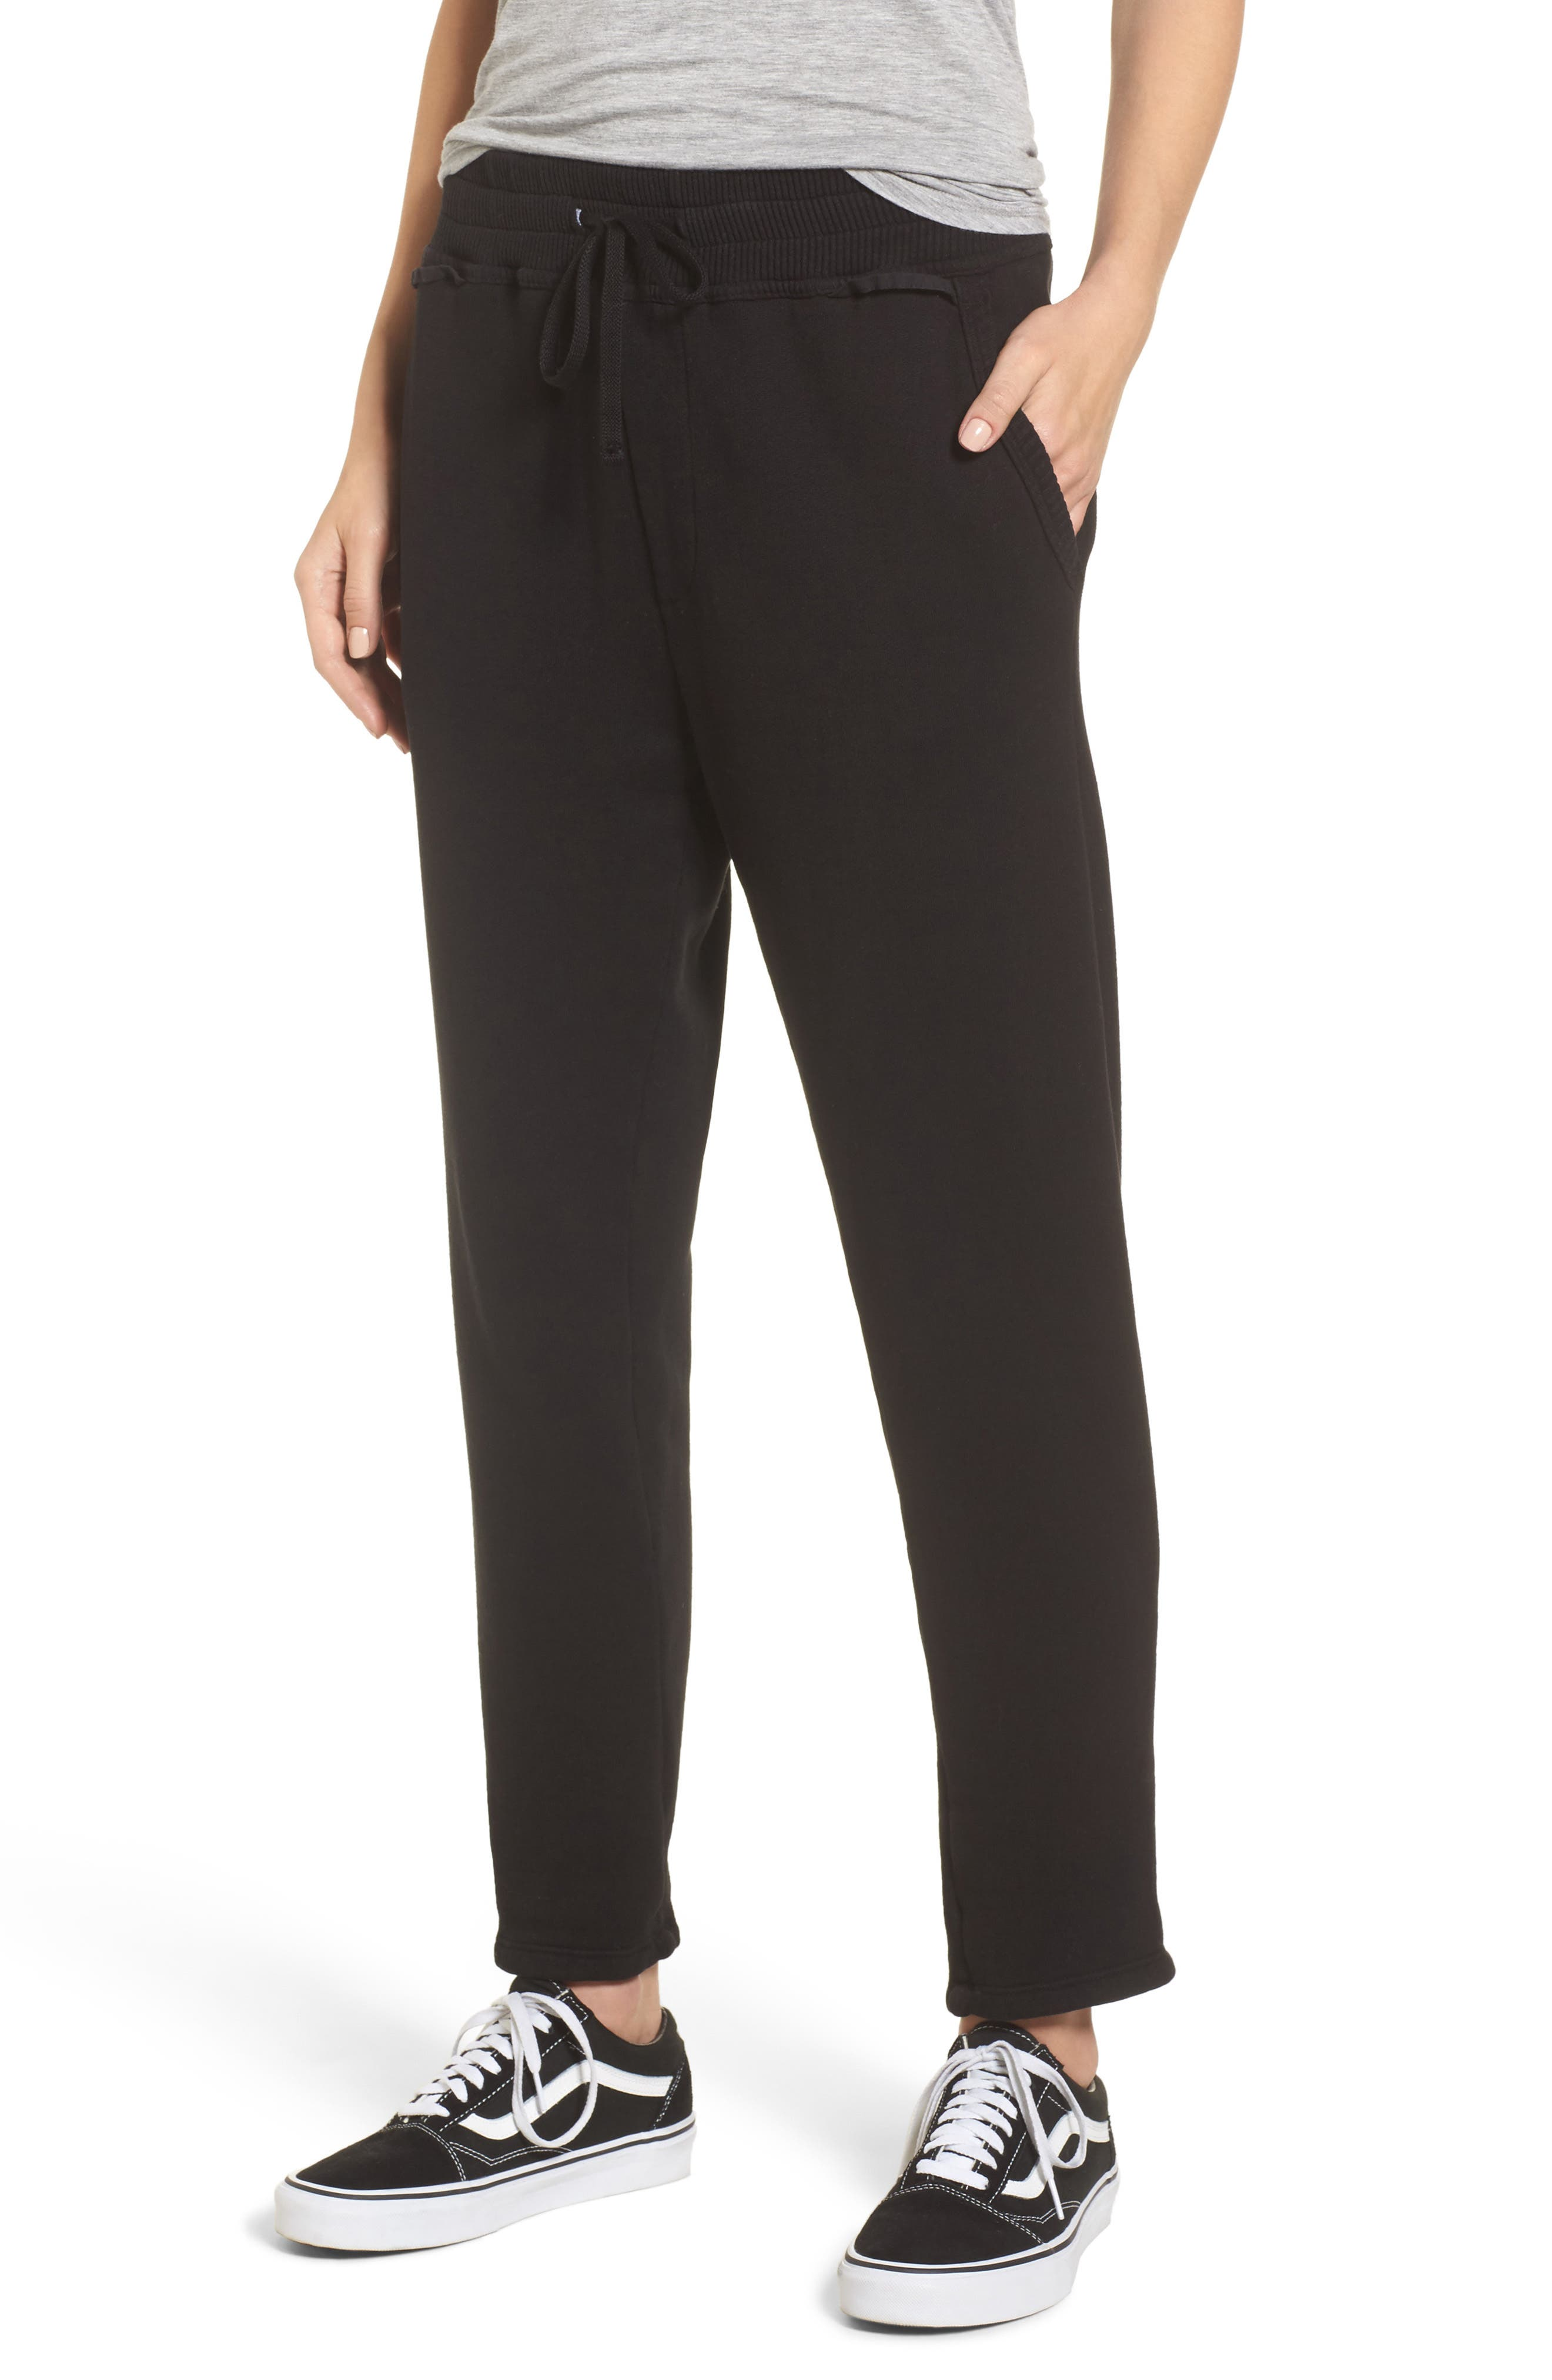 Terry Lounge Pants,                         Main,                         color, Black